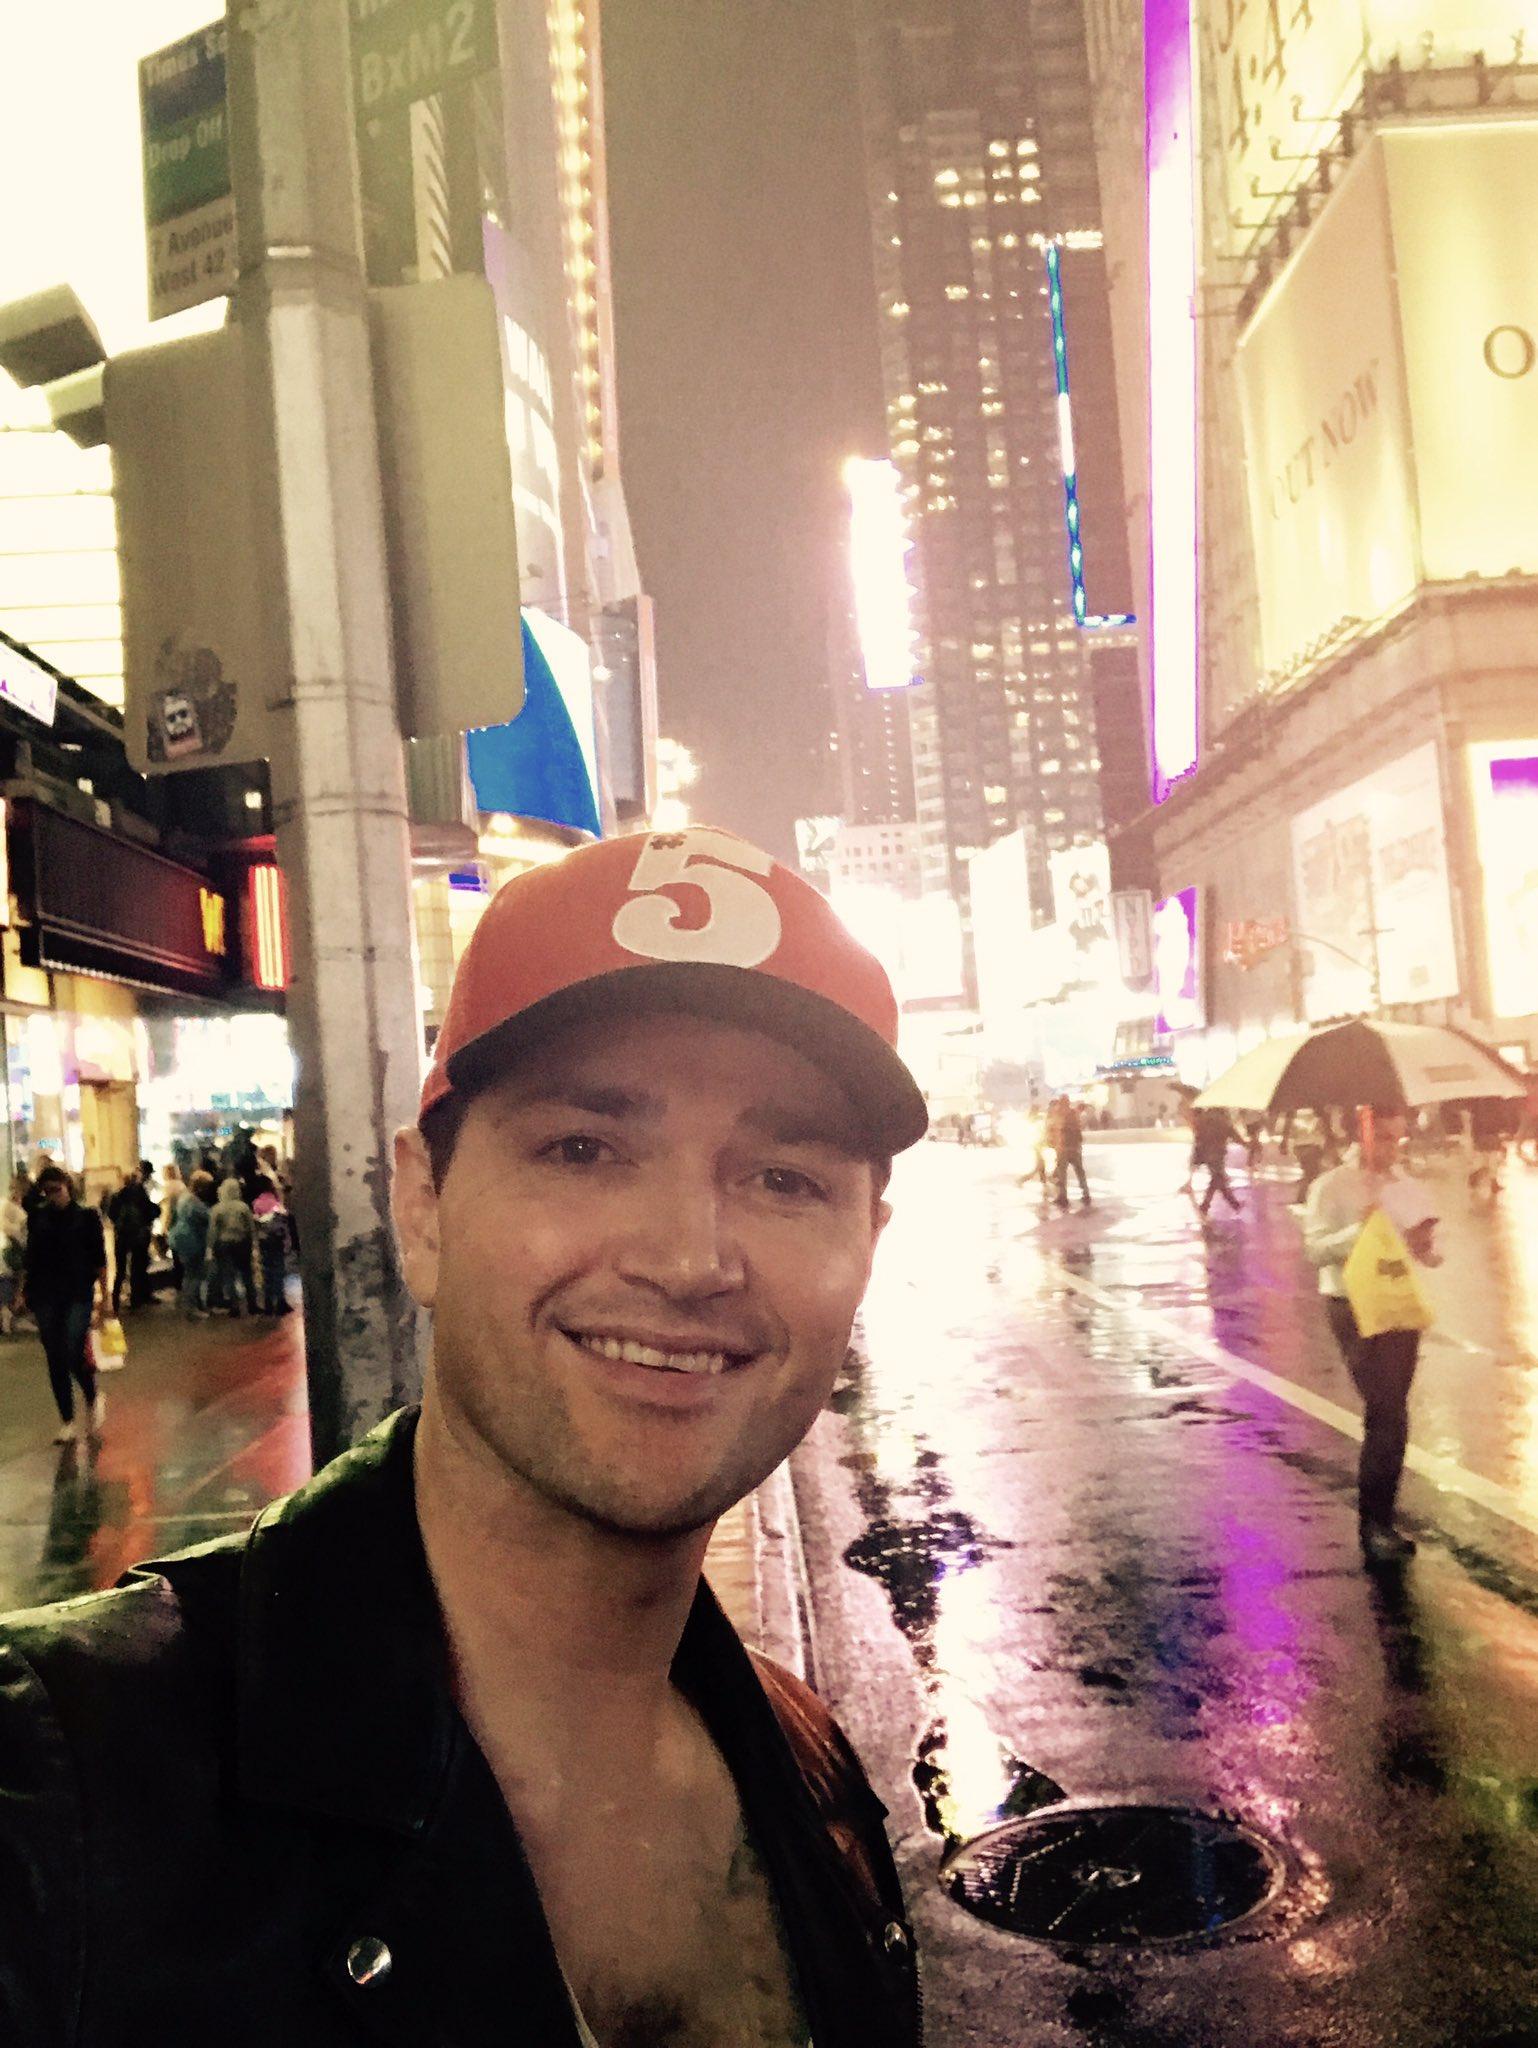 Man I love this town #NewYorkCity #FreedomChild  #Thescriptrain https://t.co/FK4cFko3UM